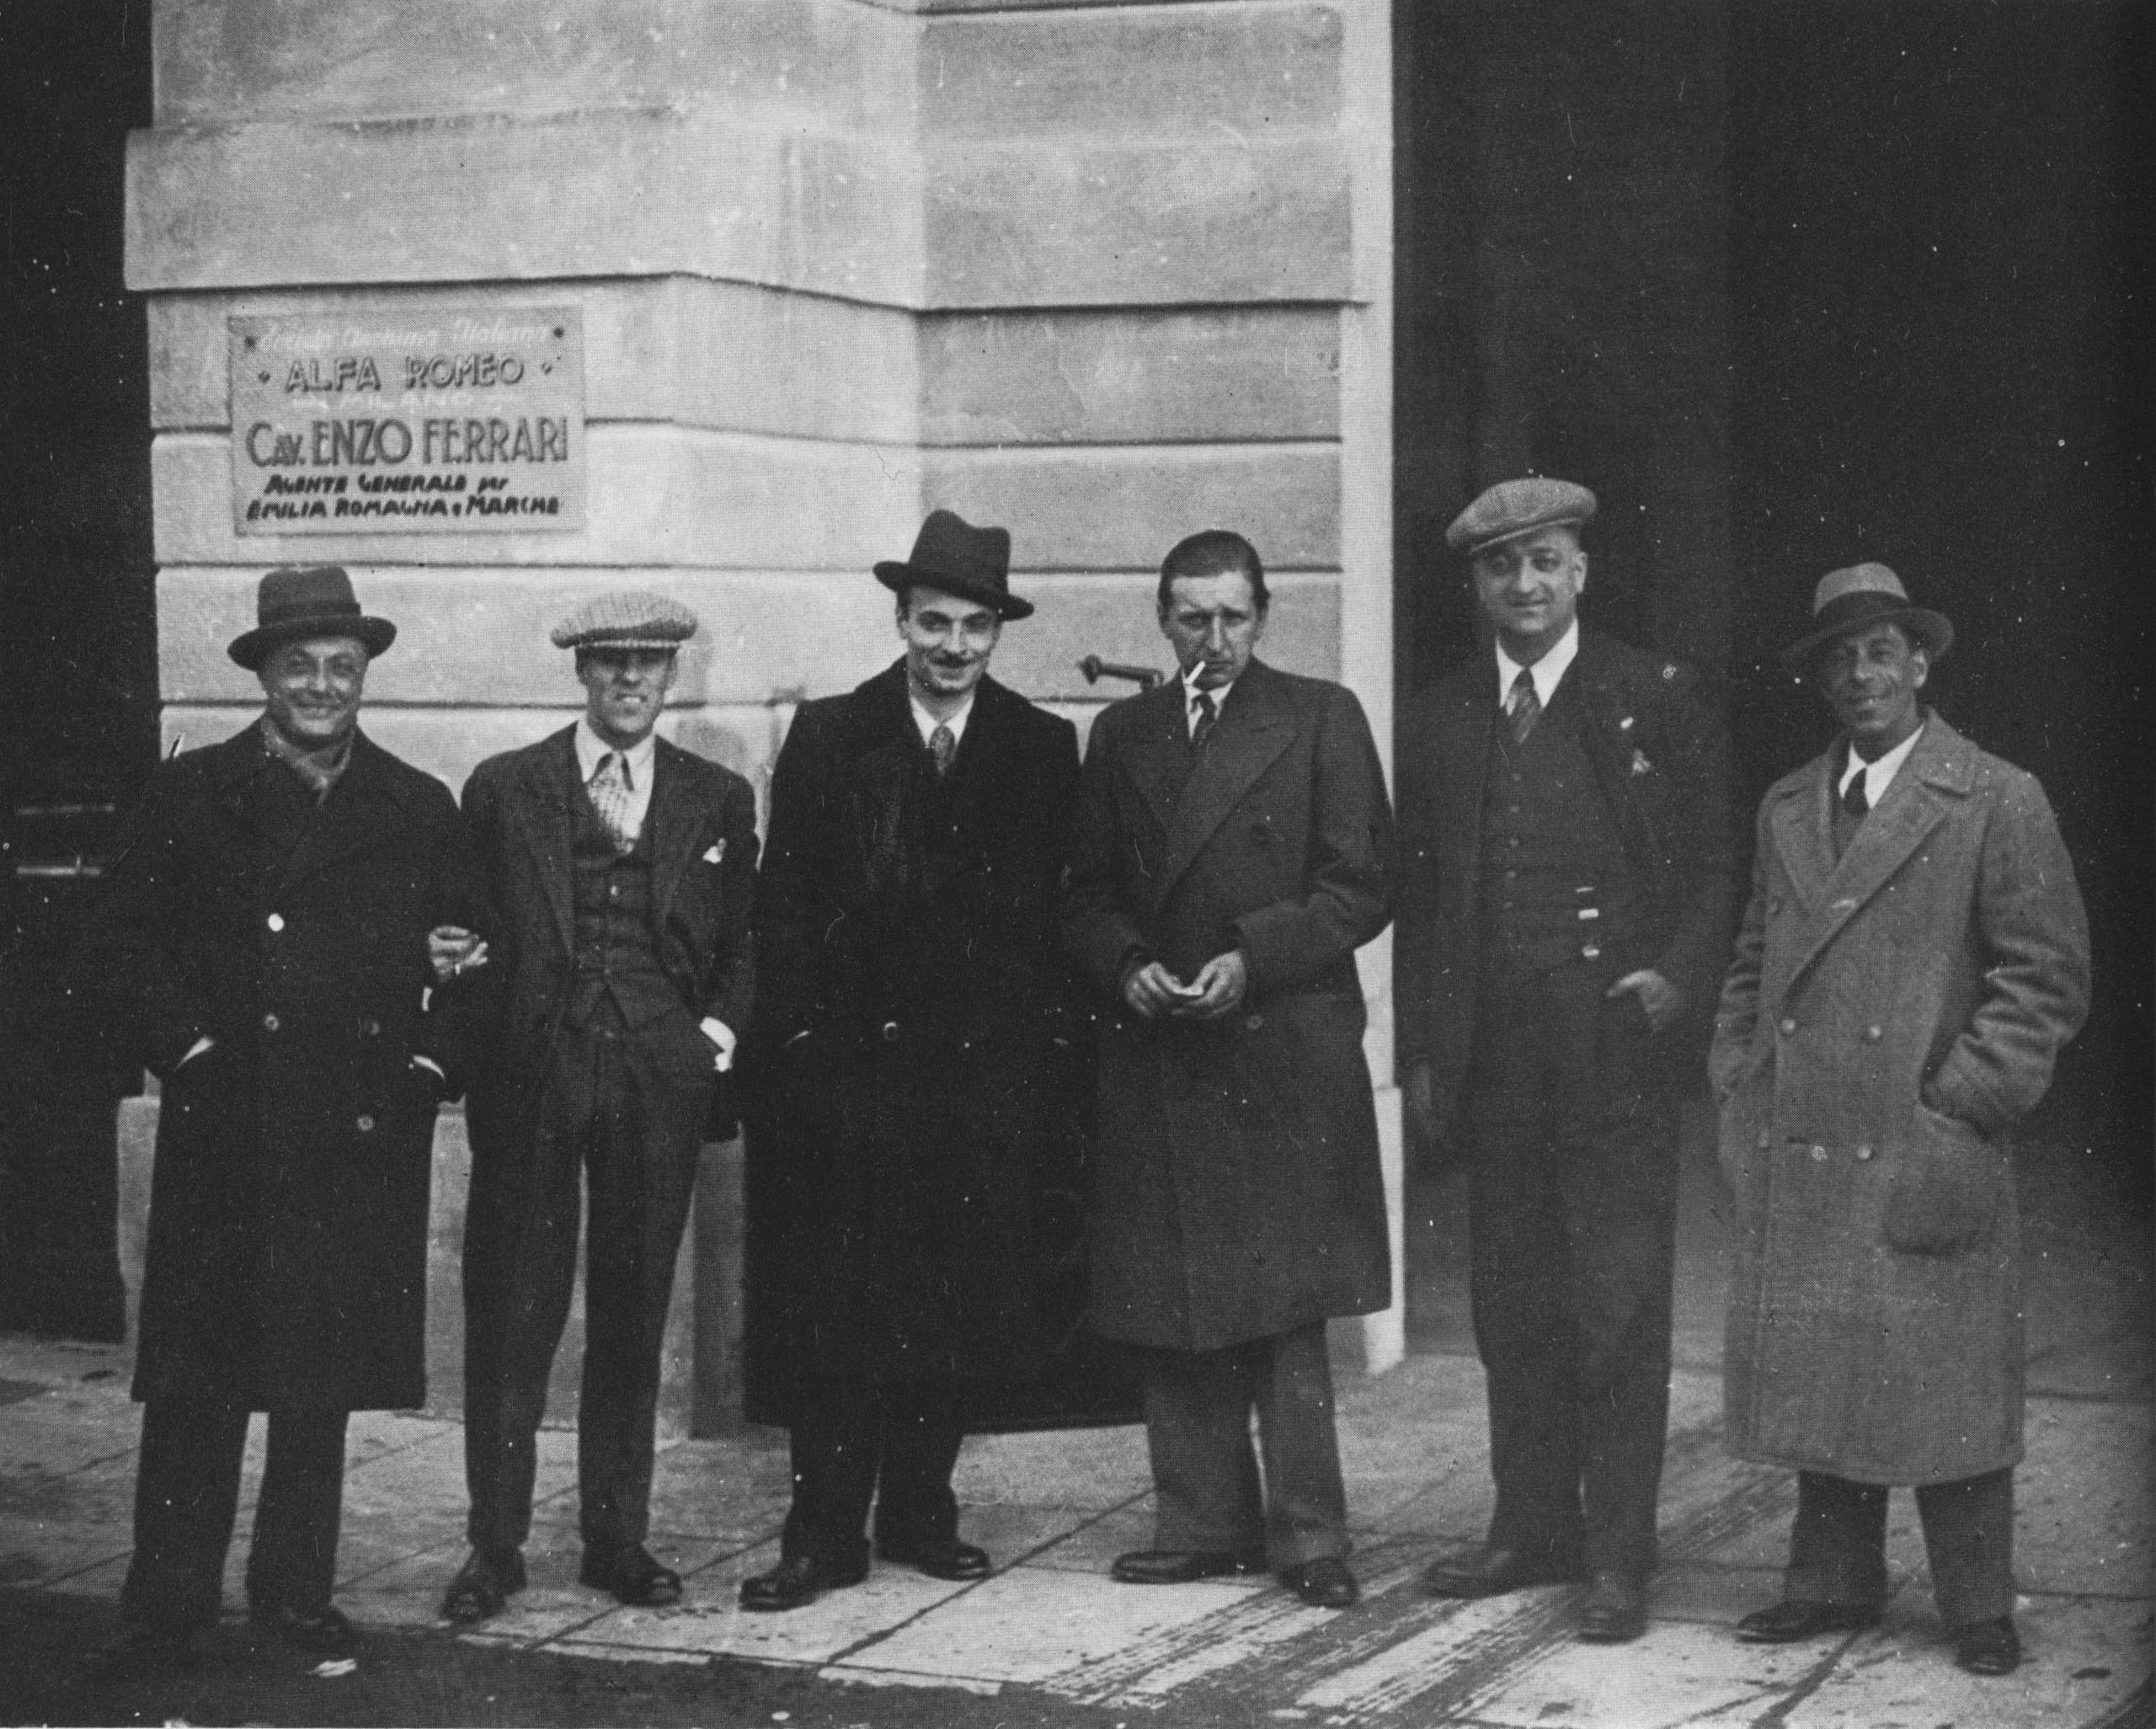 """Скудерия Феррари"" в 1932 году"